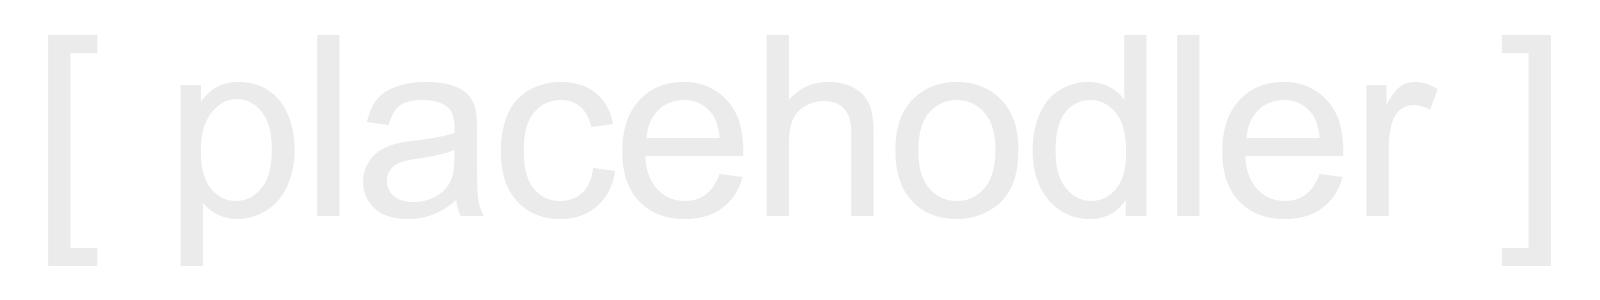 Placehodler